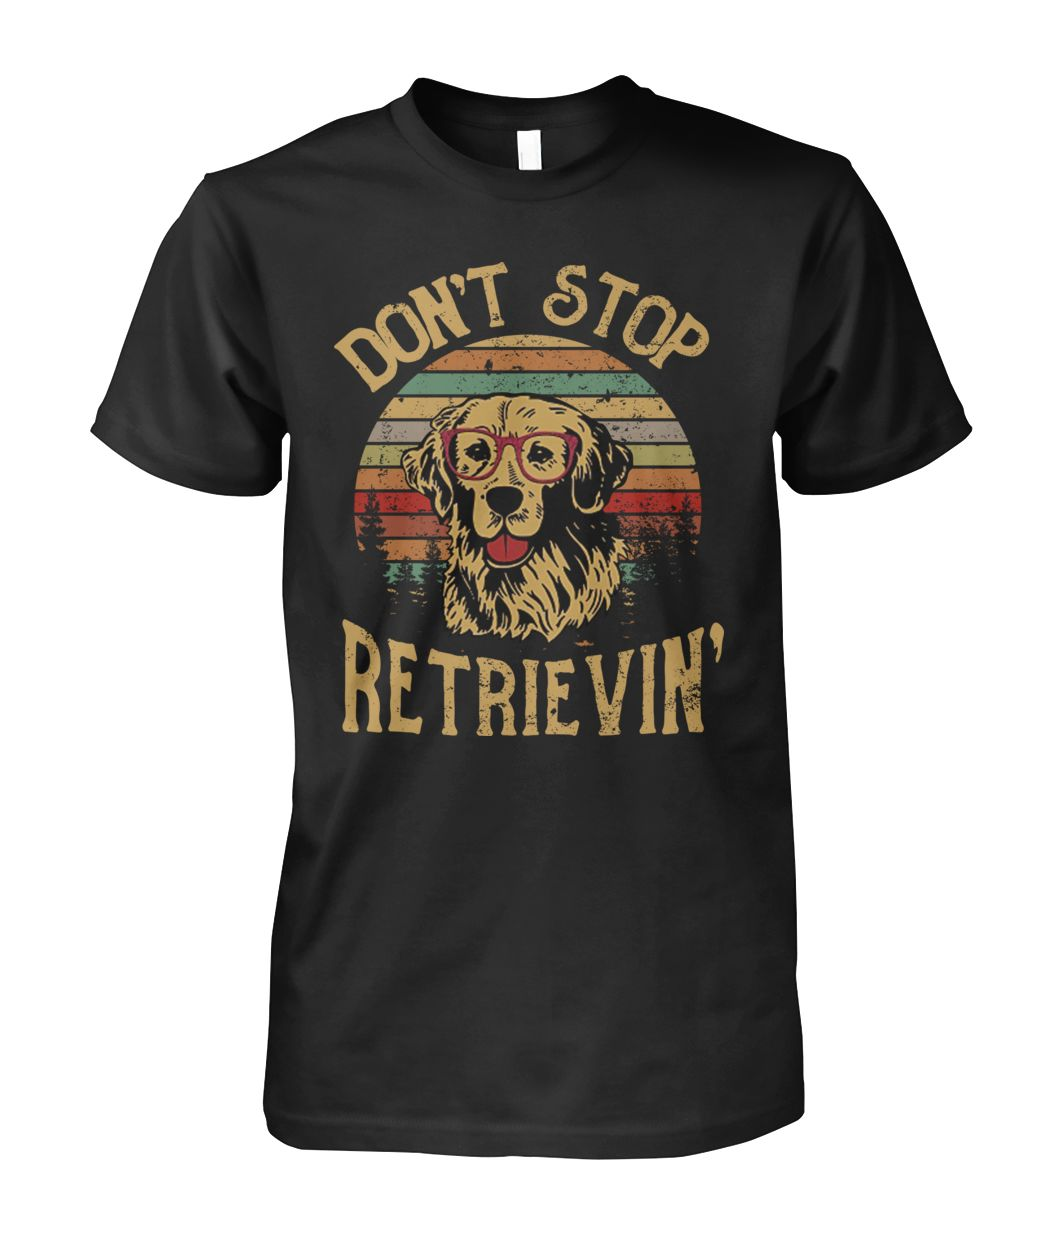 Don't stop retrievin' unisex shirt